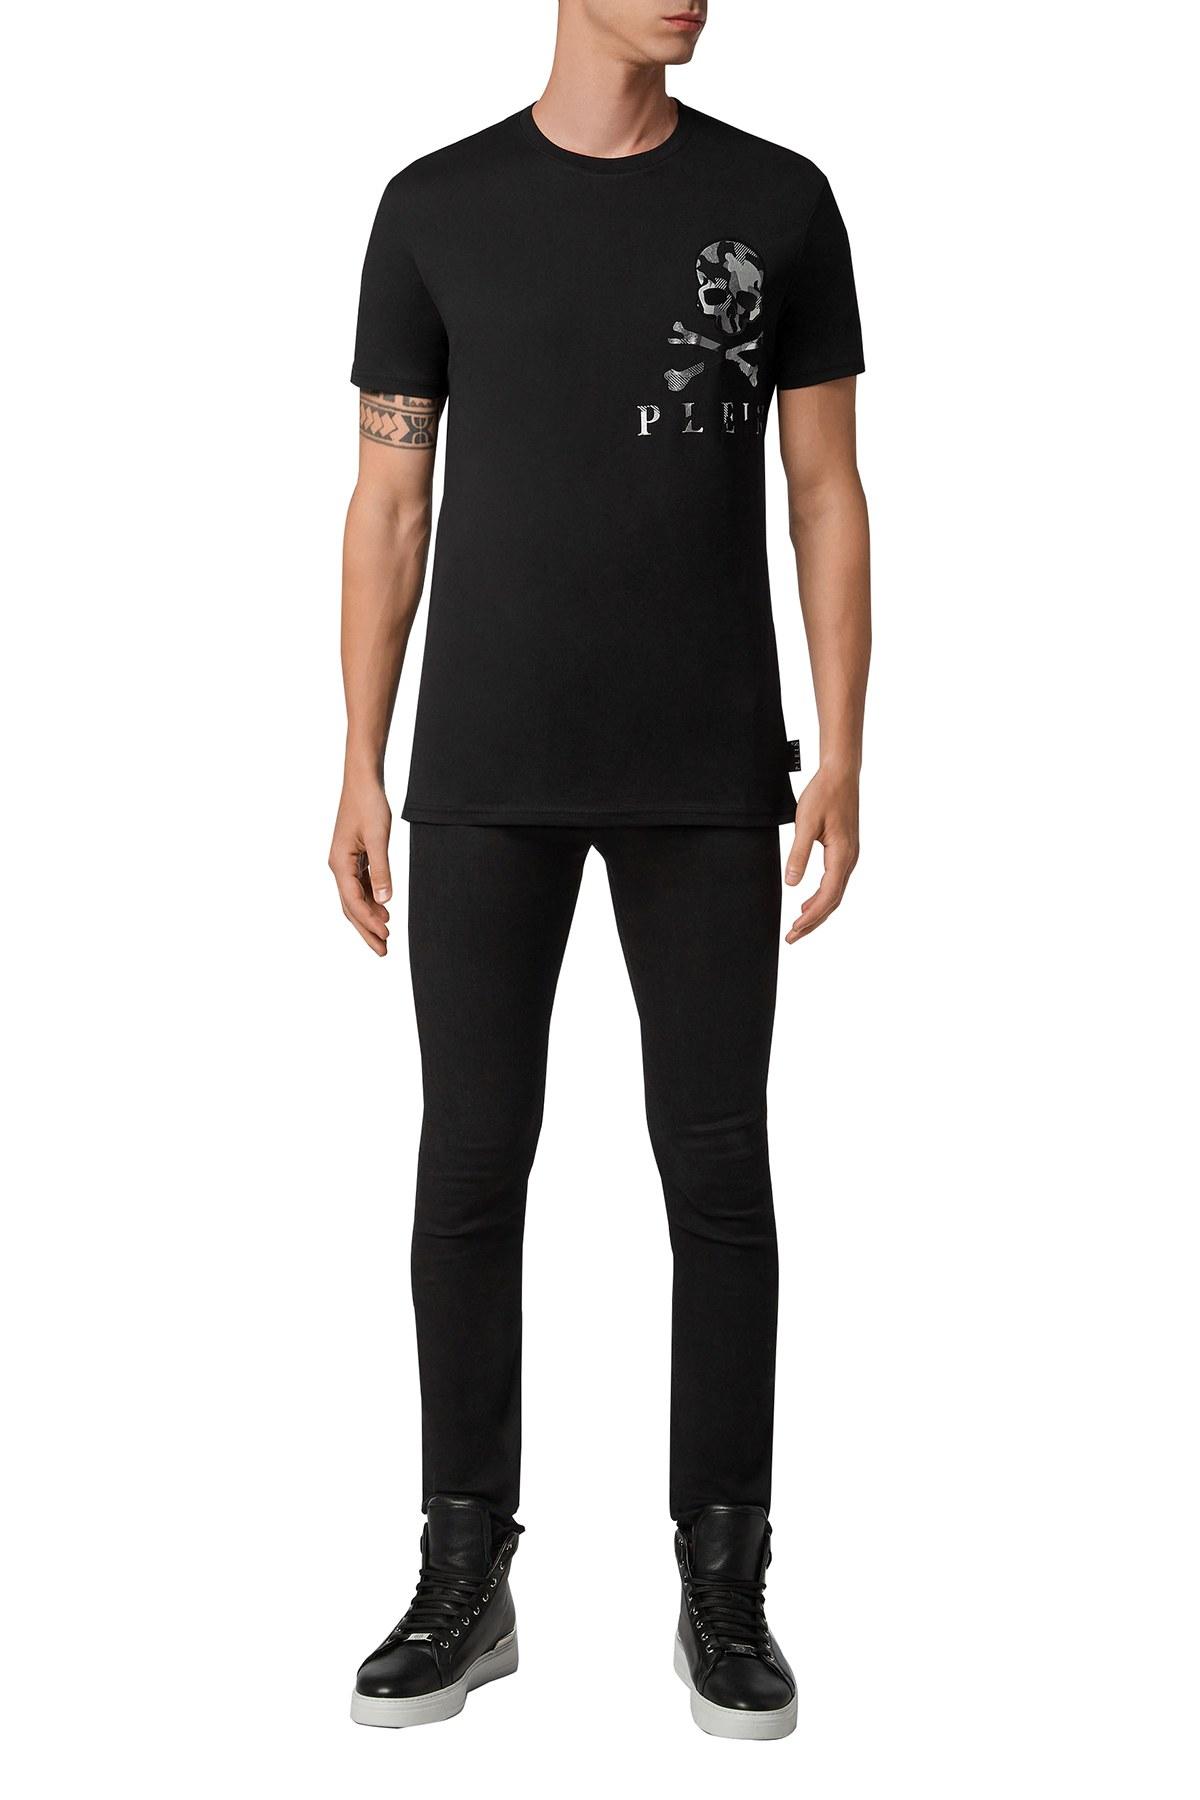 Philipp Plein Baskılı % 100 Pamuklu Erkek T Shirt F20C MTK4594 PJY002N 02 SİYAH